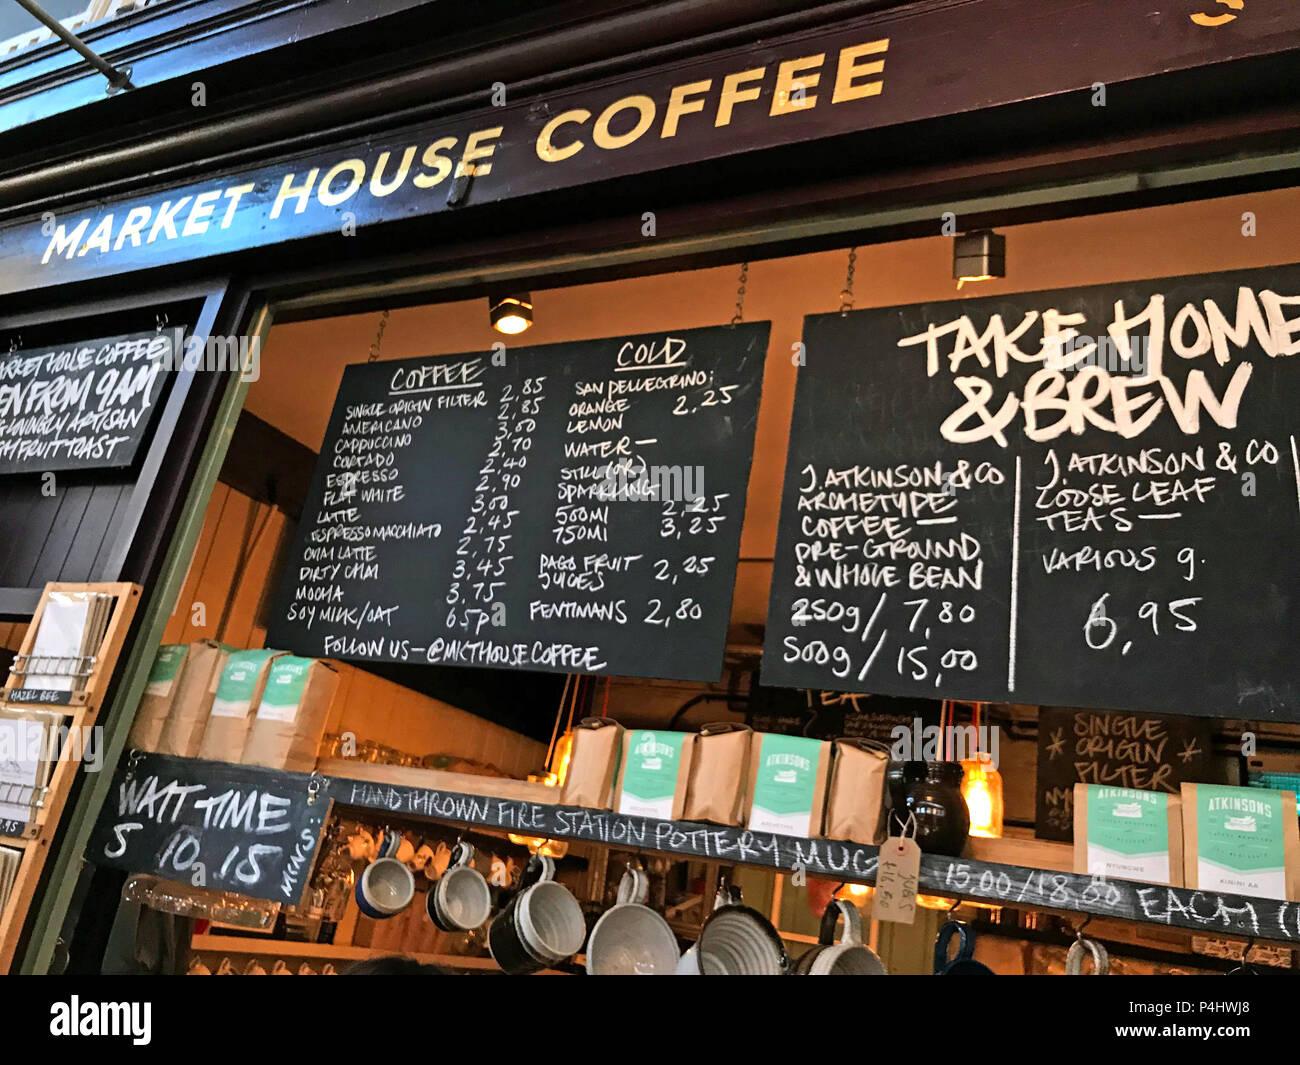 Market House Coffee stall, mercado de Altrincham, hall, Market Street, Altrincham, Trafford, Greater Manchester, North West England, Foto de stock